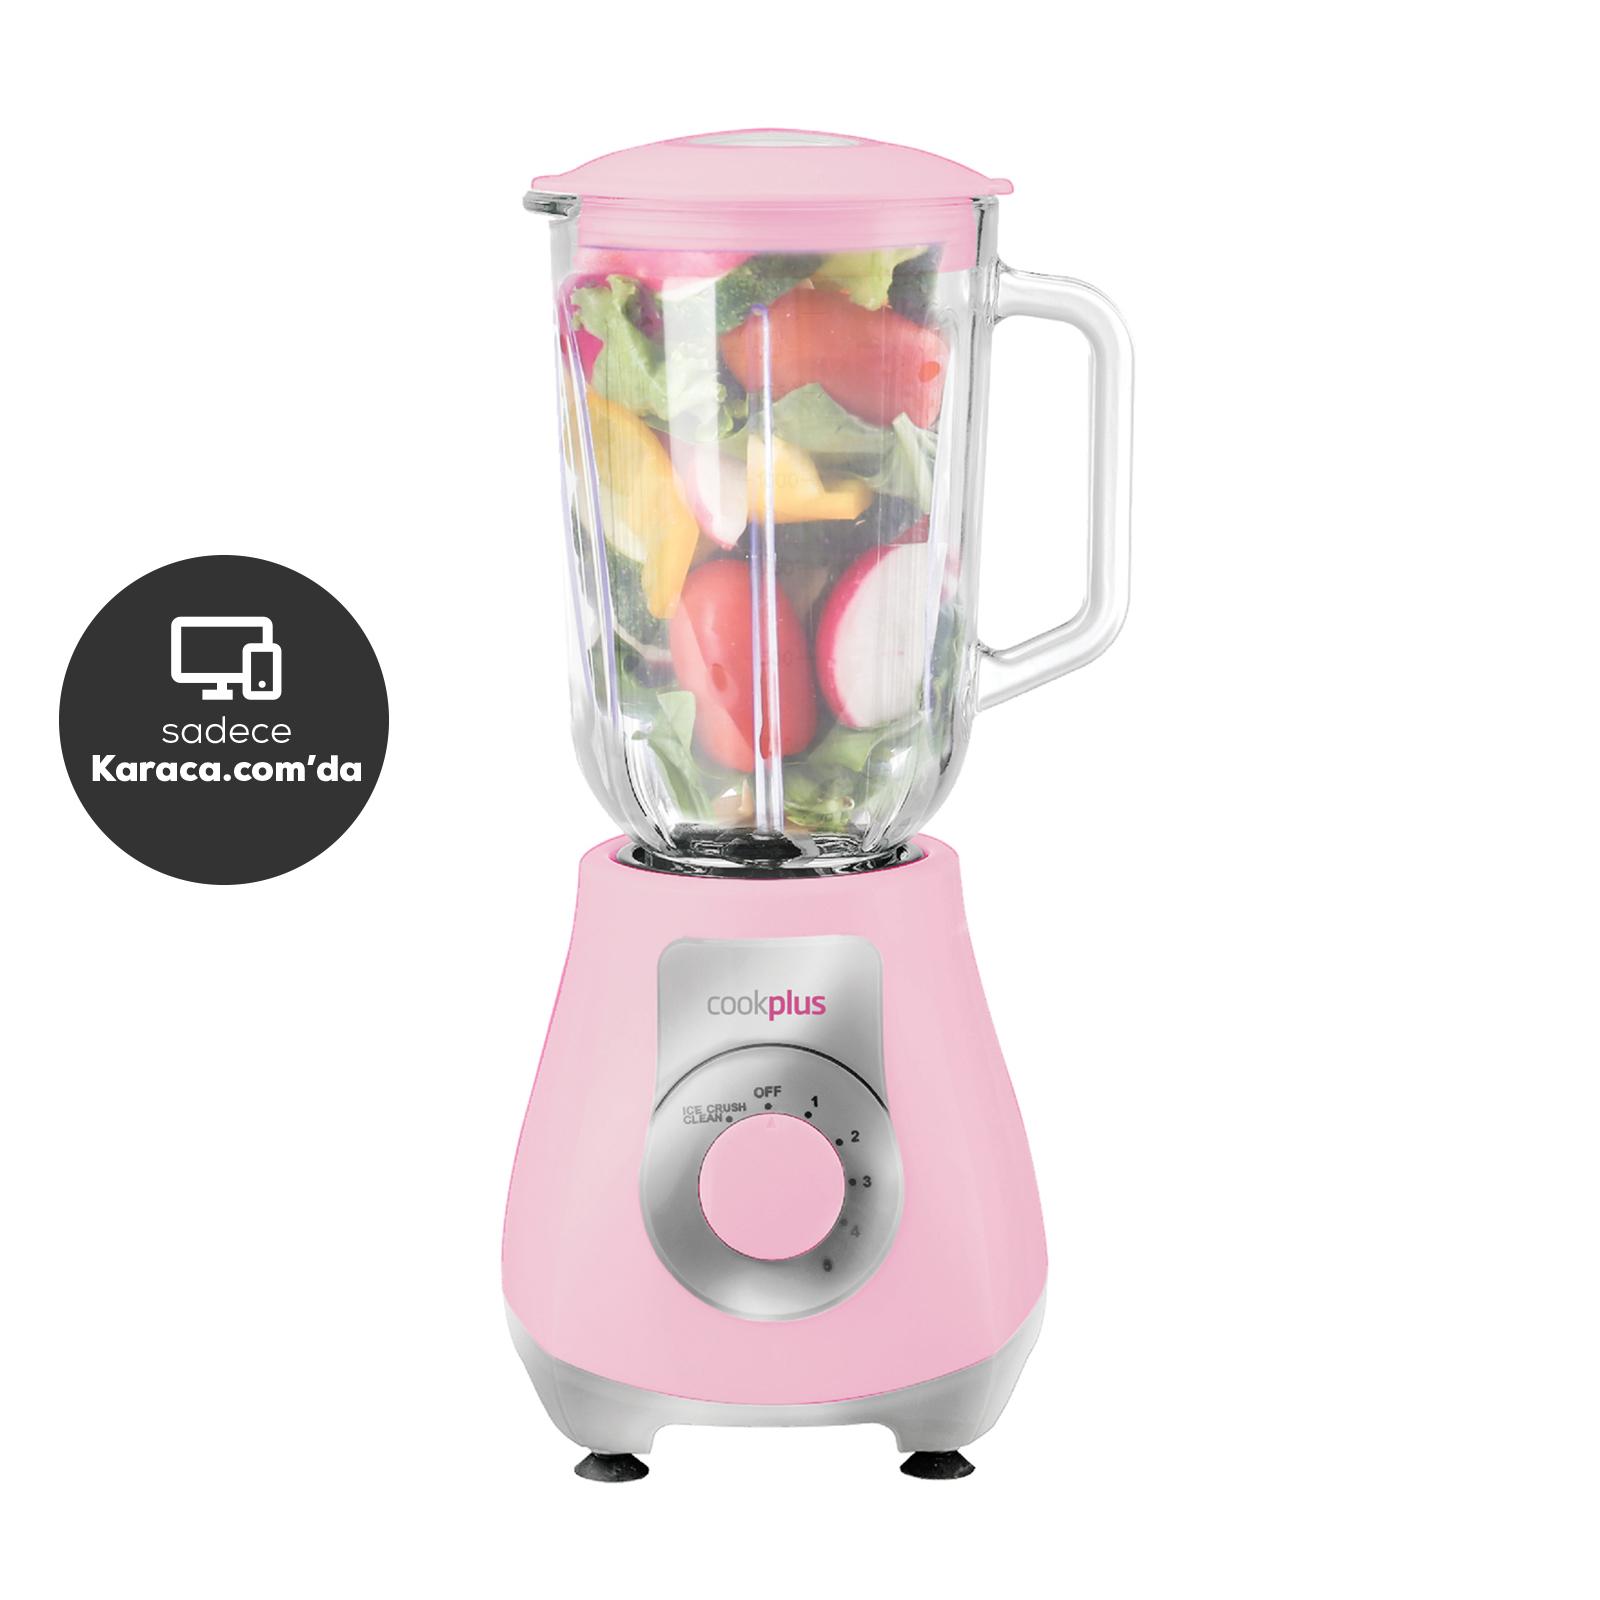 Cookplus by Karaca Smoothie Shaker Pink Blender 751 Xl